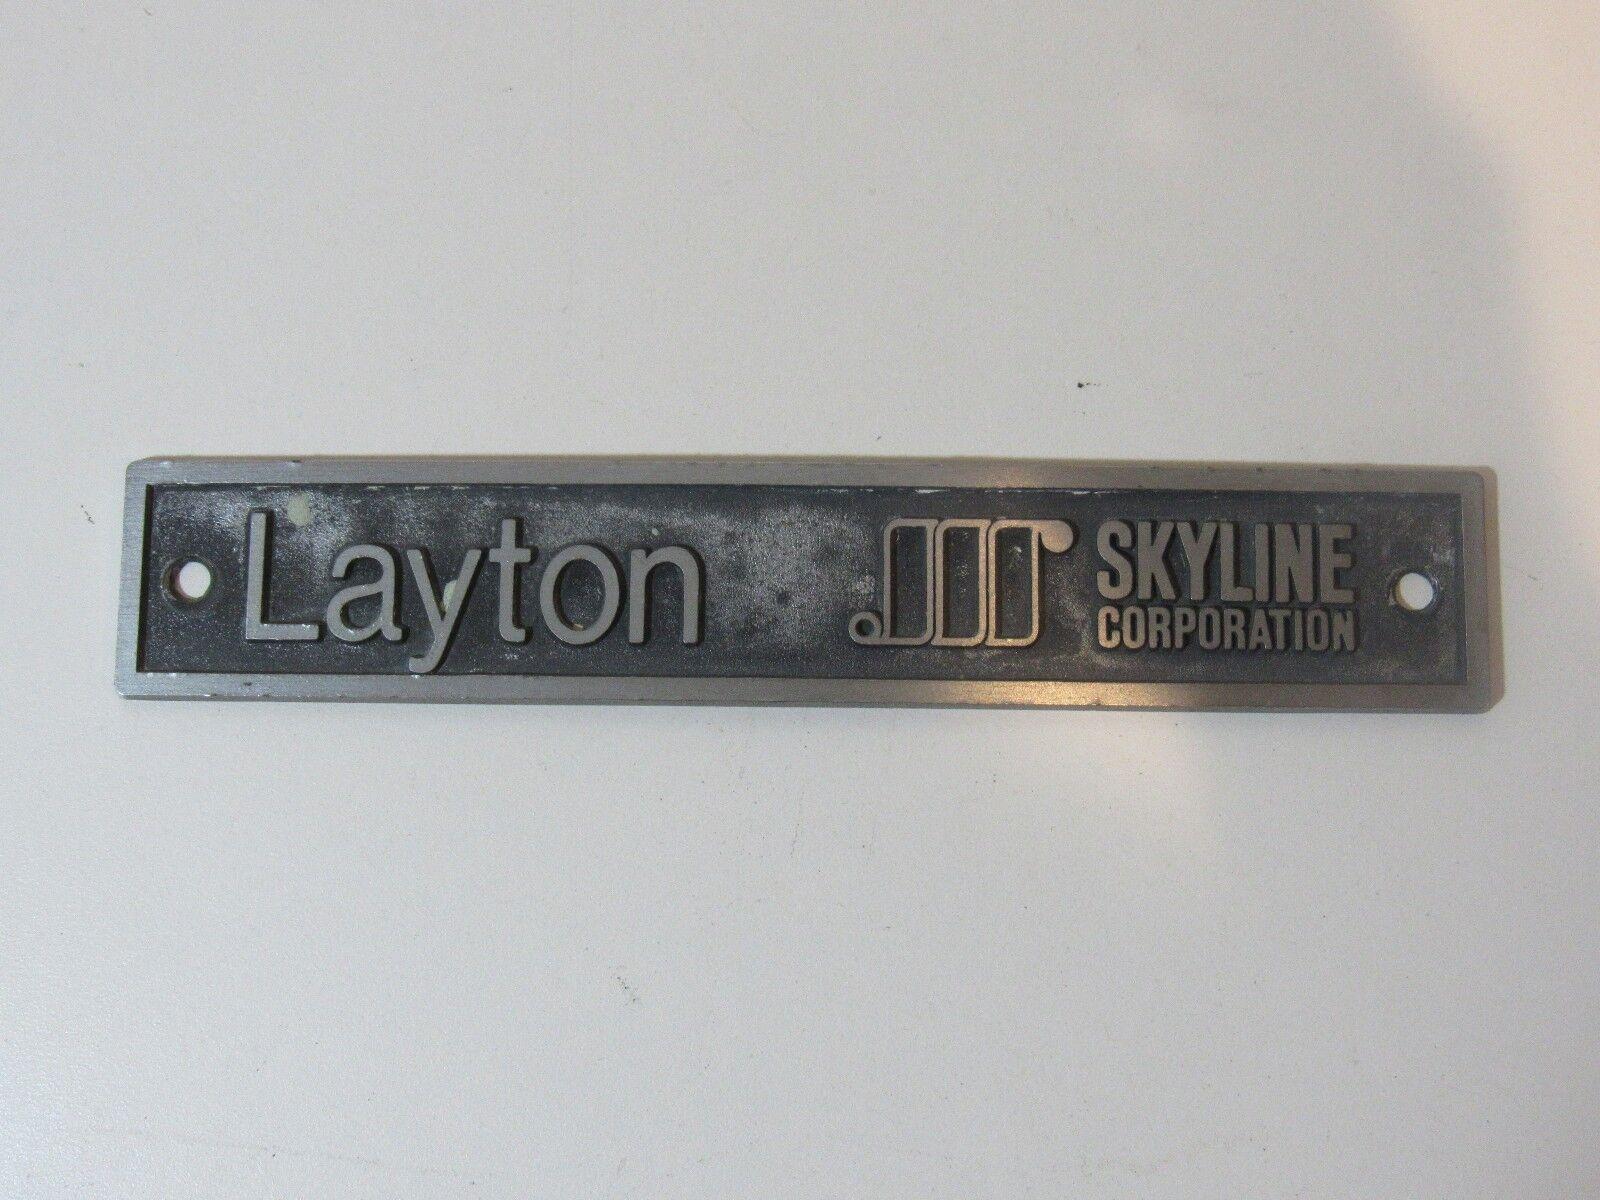 Vintage Latyton Skyline Travel Trailer Emblem Nameplate Ornament RV Airstream